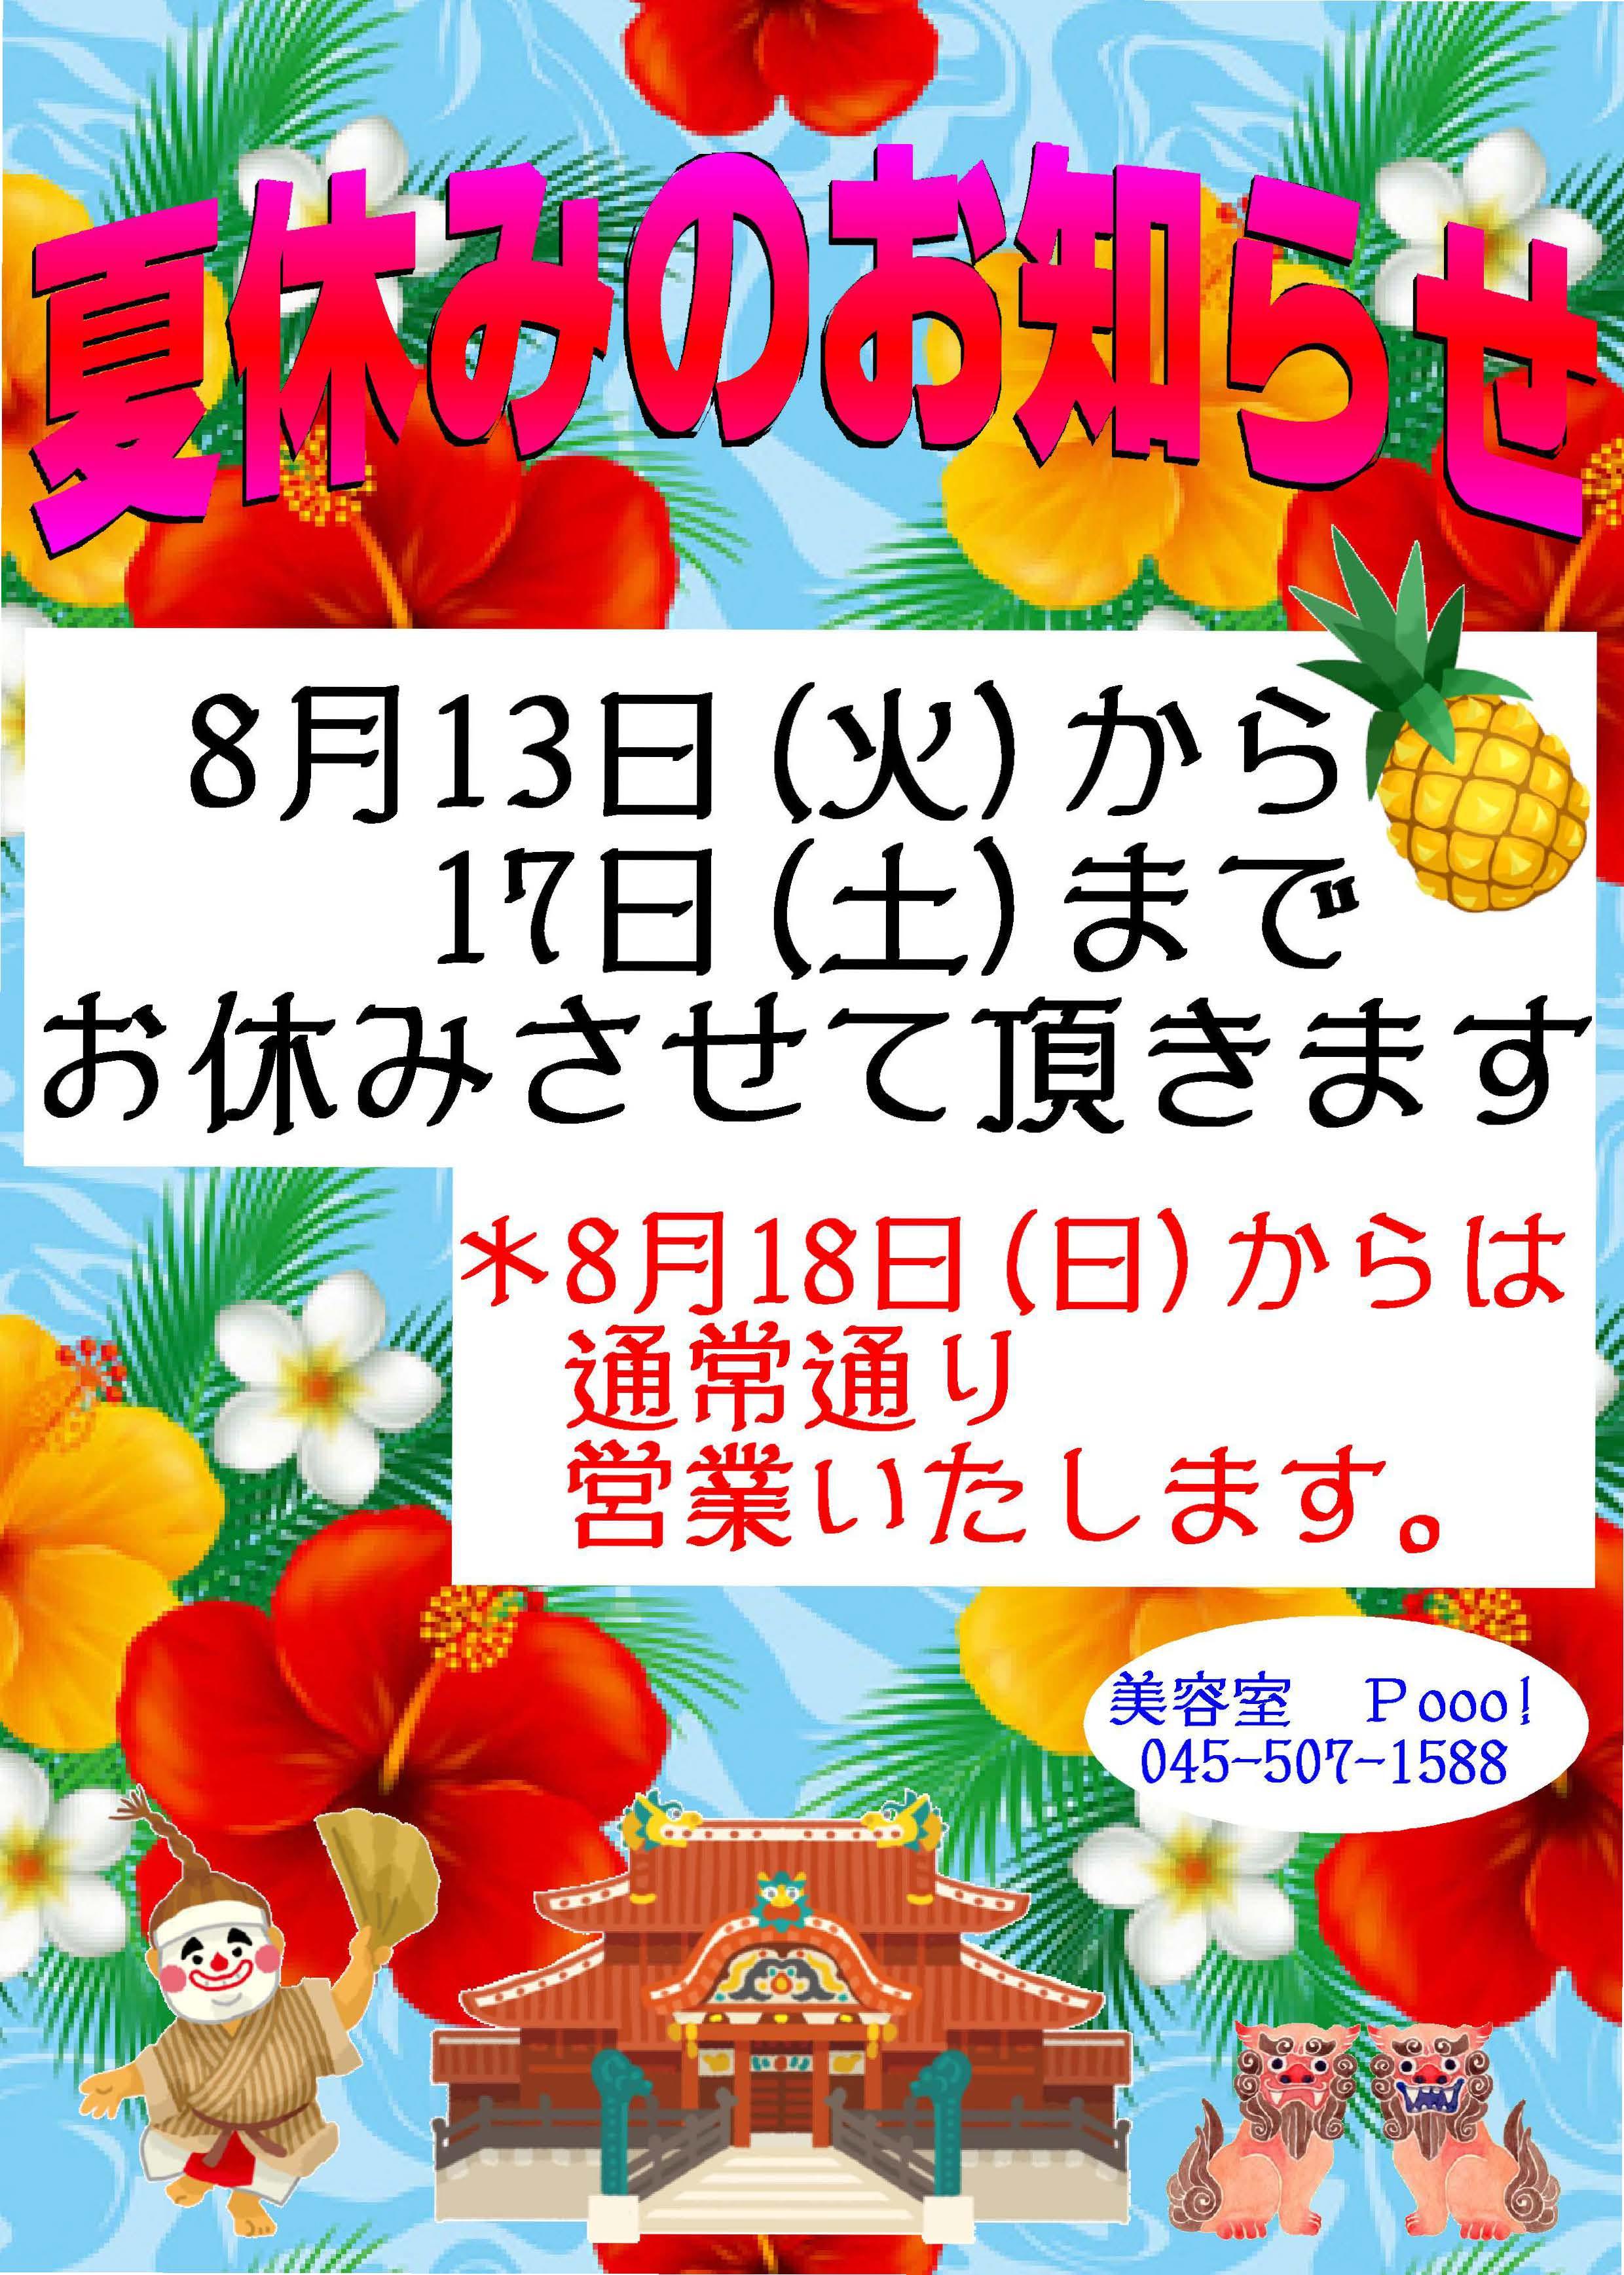 https://pooo.jp/wp-content/uploads/2019/05/Pooosummer-vacation_2019.jpg